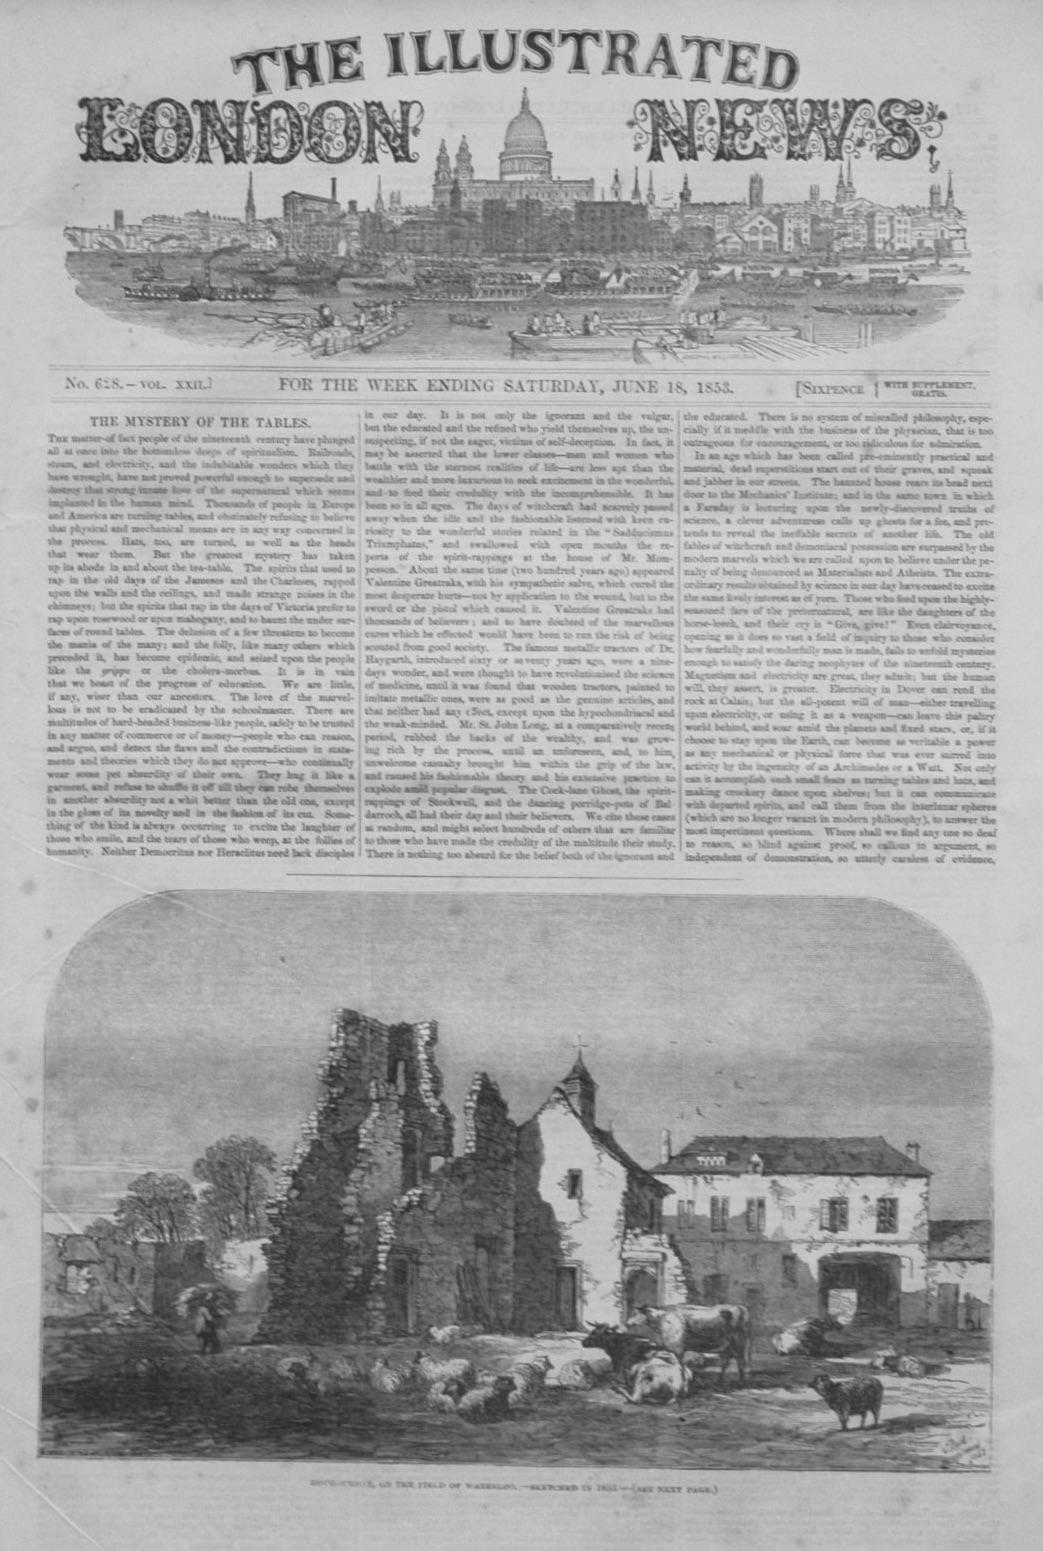 Illustrated London News June 18th, 1853.